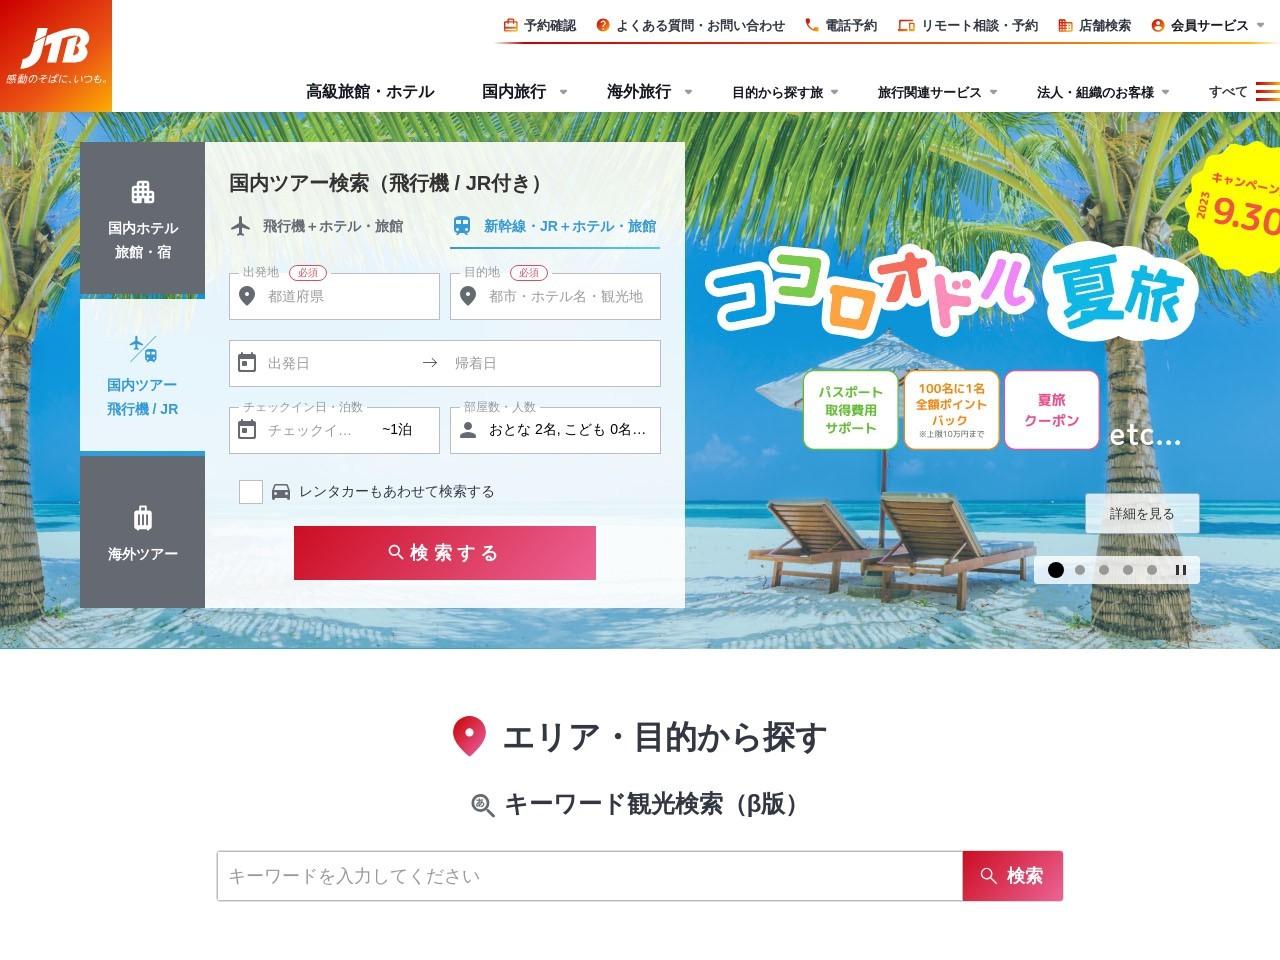 http://www.jtb.co.jp/shop/takamatsu-dantai/info/kame3/